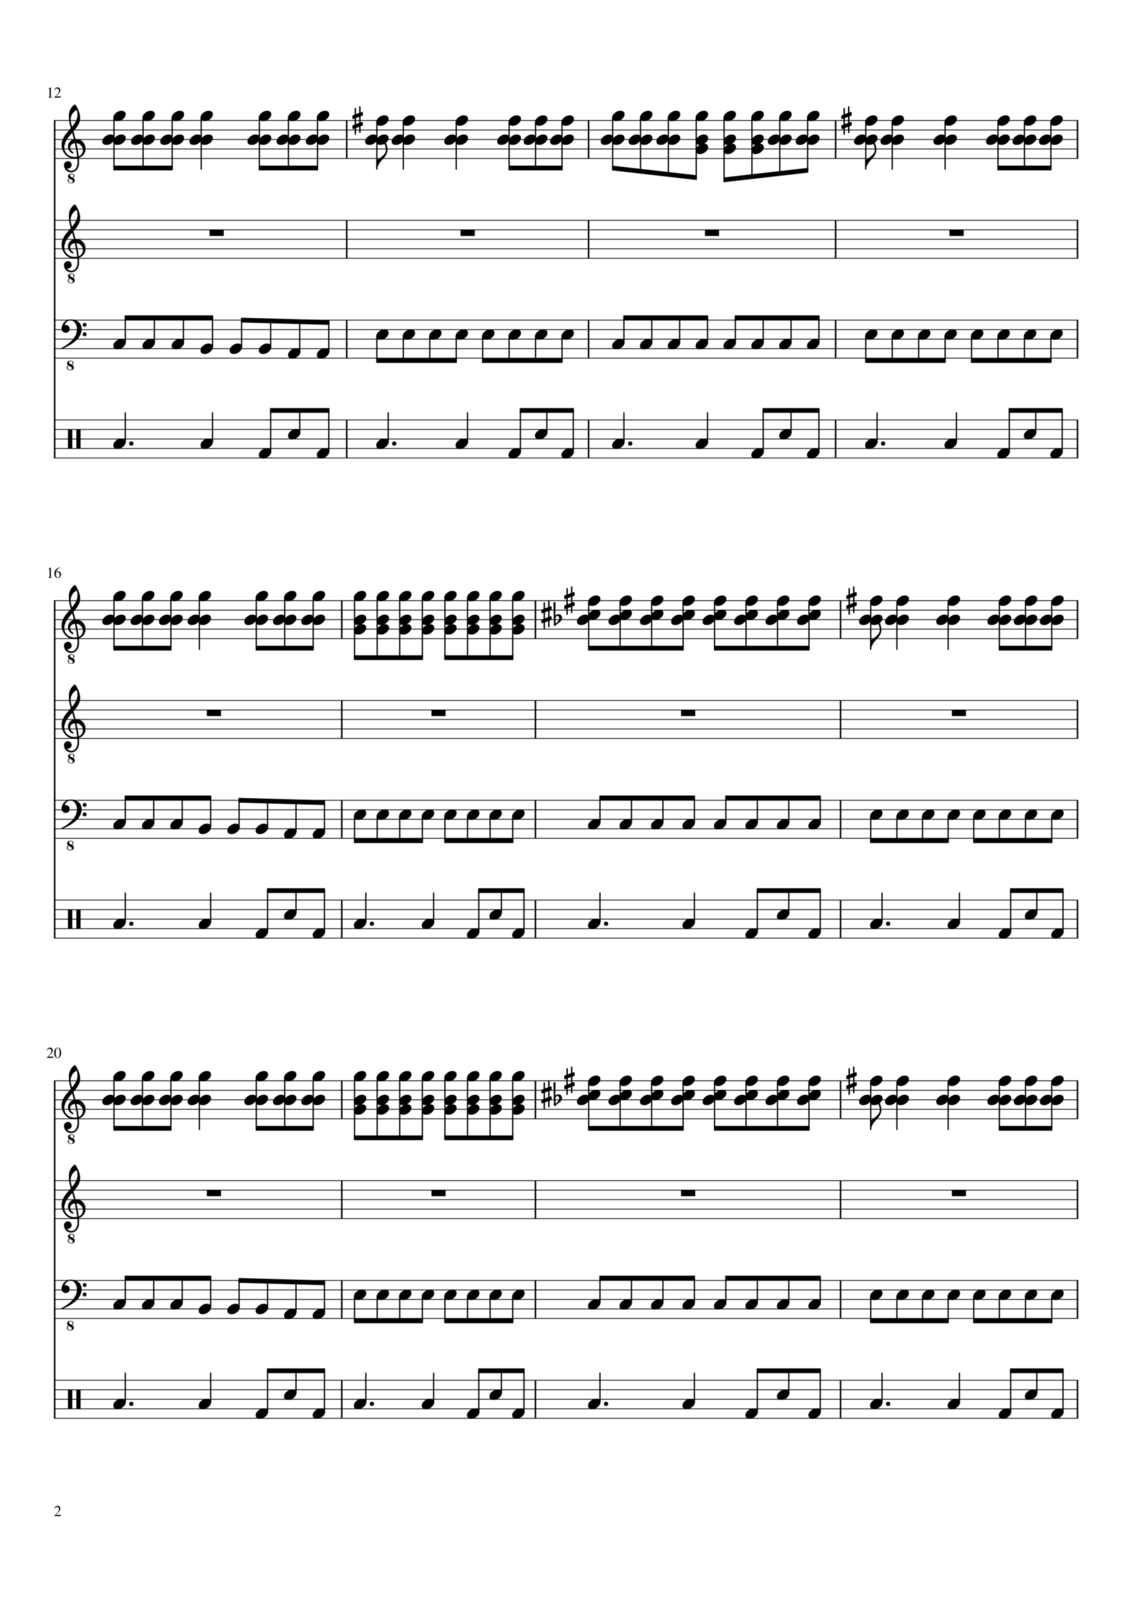 Deklassirovannyim elementam slide, Image 2